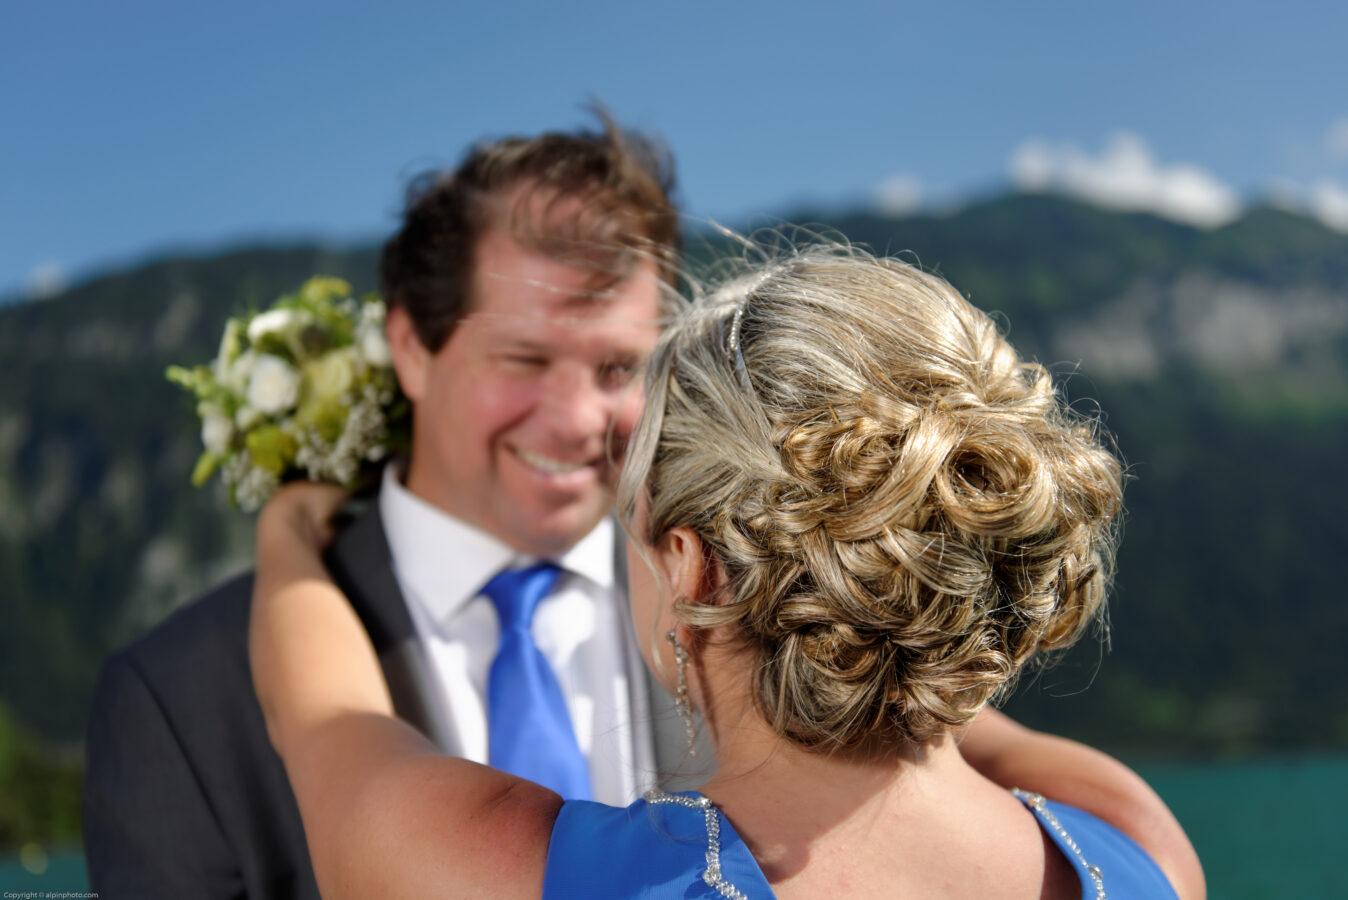 elope in switzerland, photographer, officiant